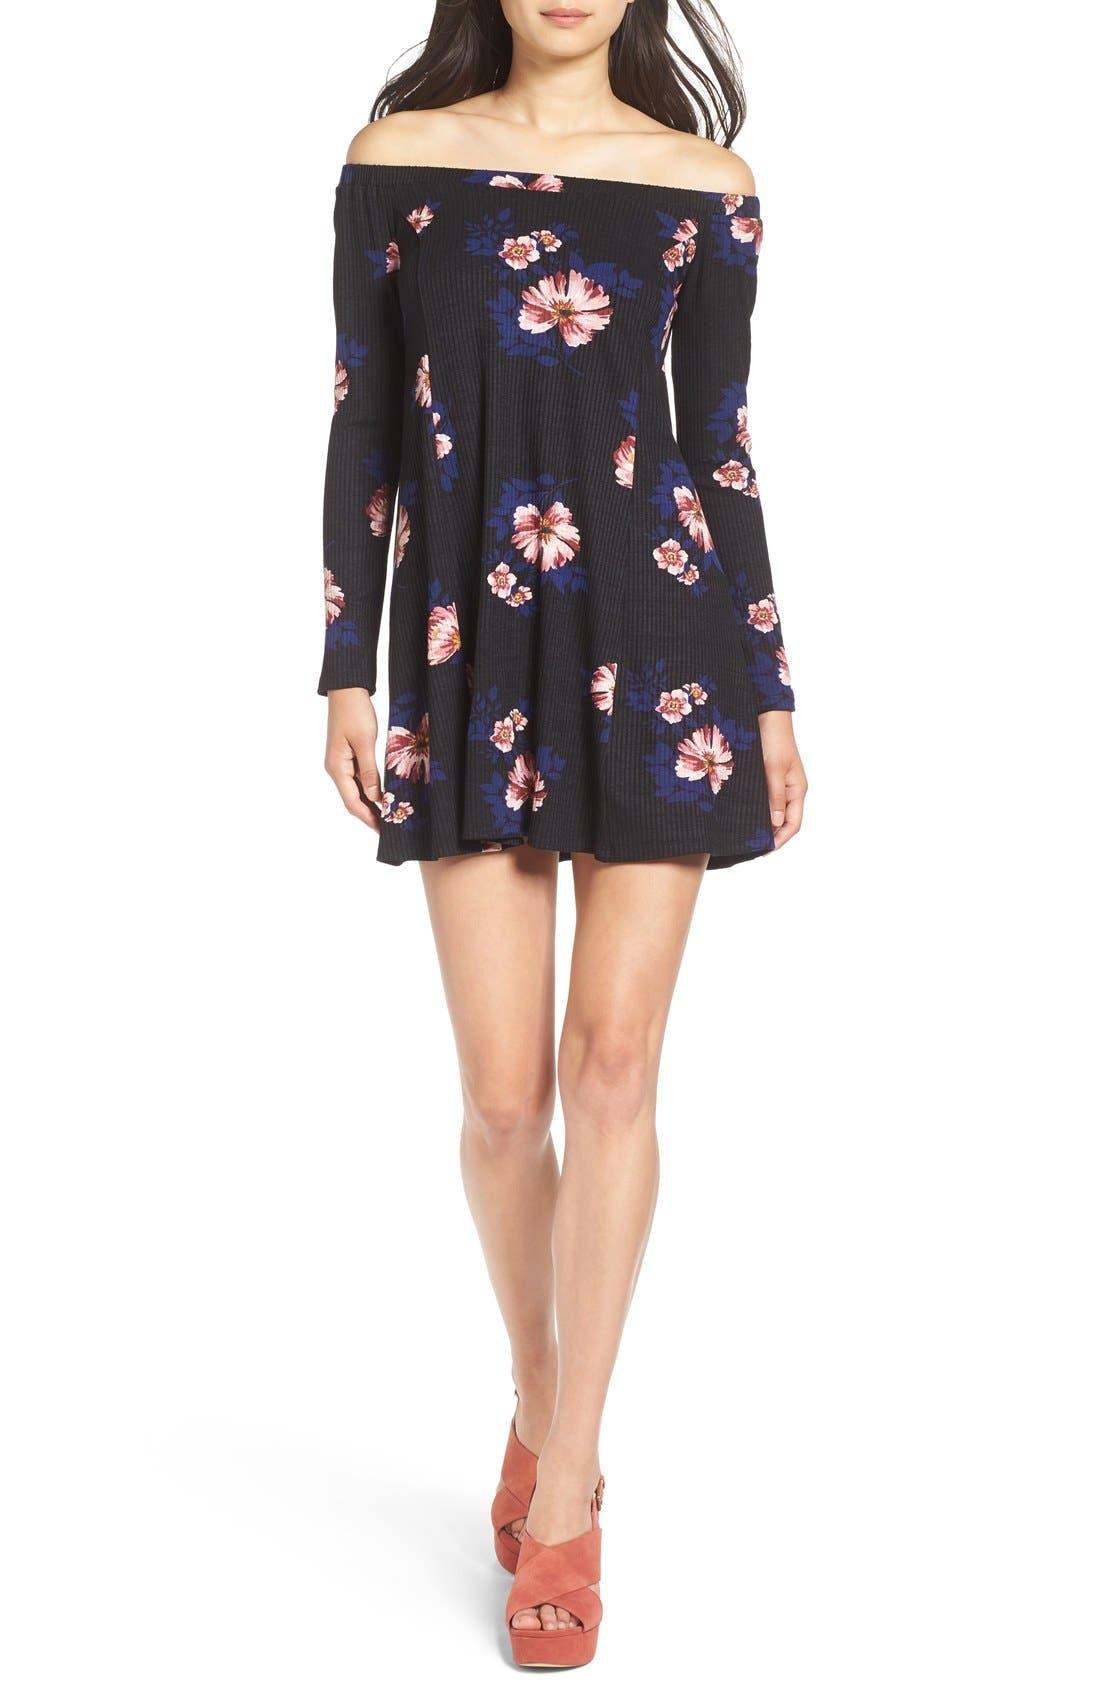 Main Image - Lush Off the Shoulder Floral Print Dress